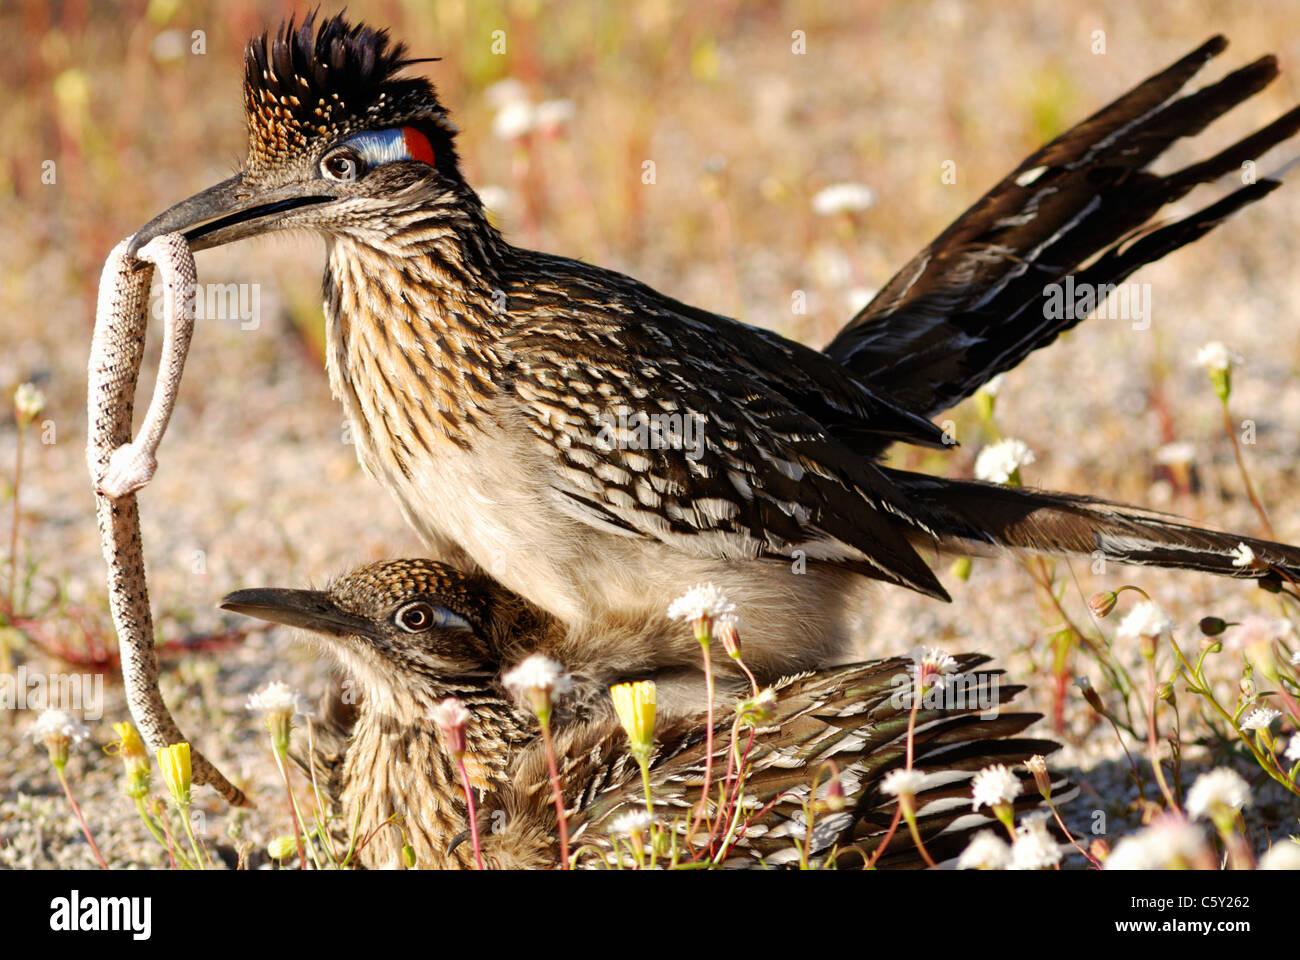 Greater roadrunner (Geococcyx californianus) mating, Anza-Borrego desert state park, California, USA - Stock Image